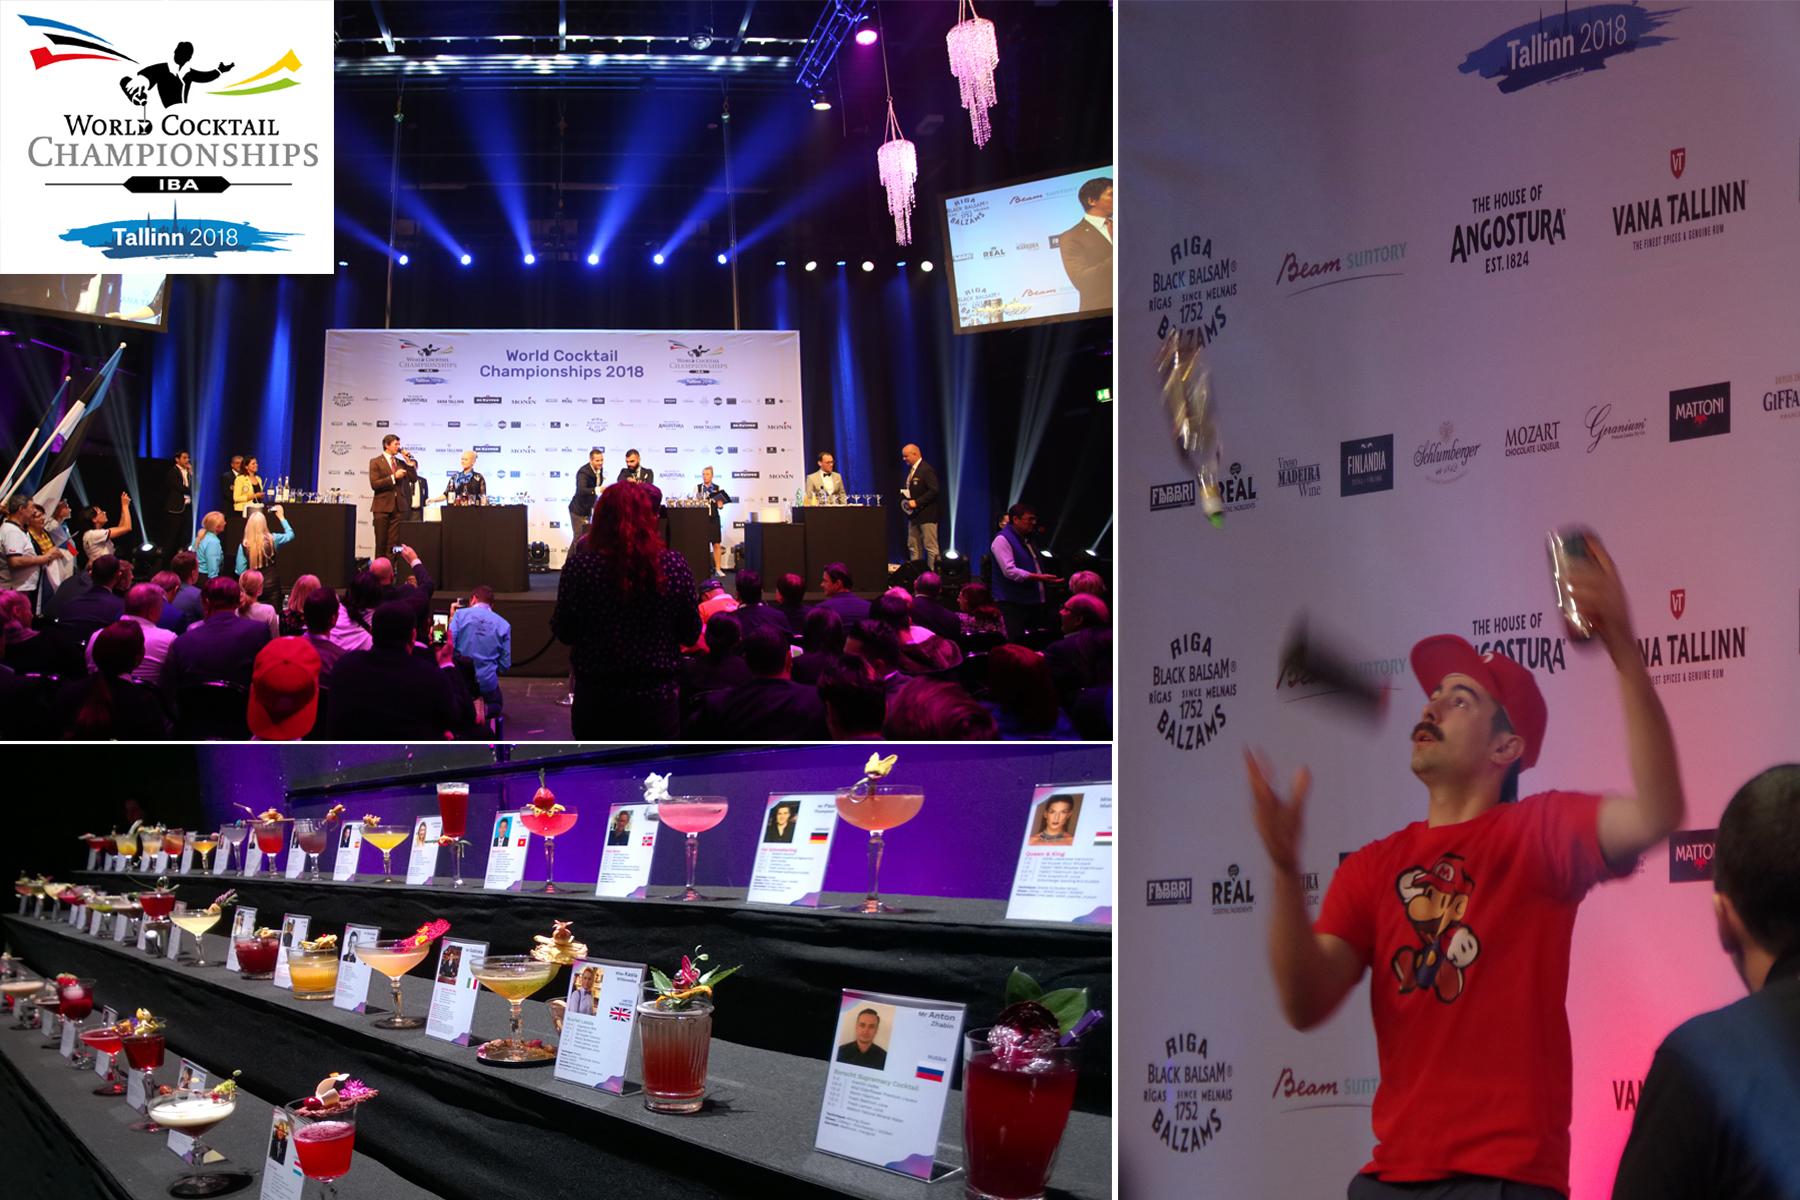 WorldCocktailChampionships 2018 Tallinn